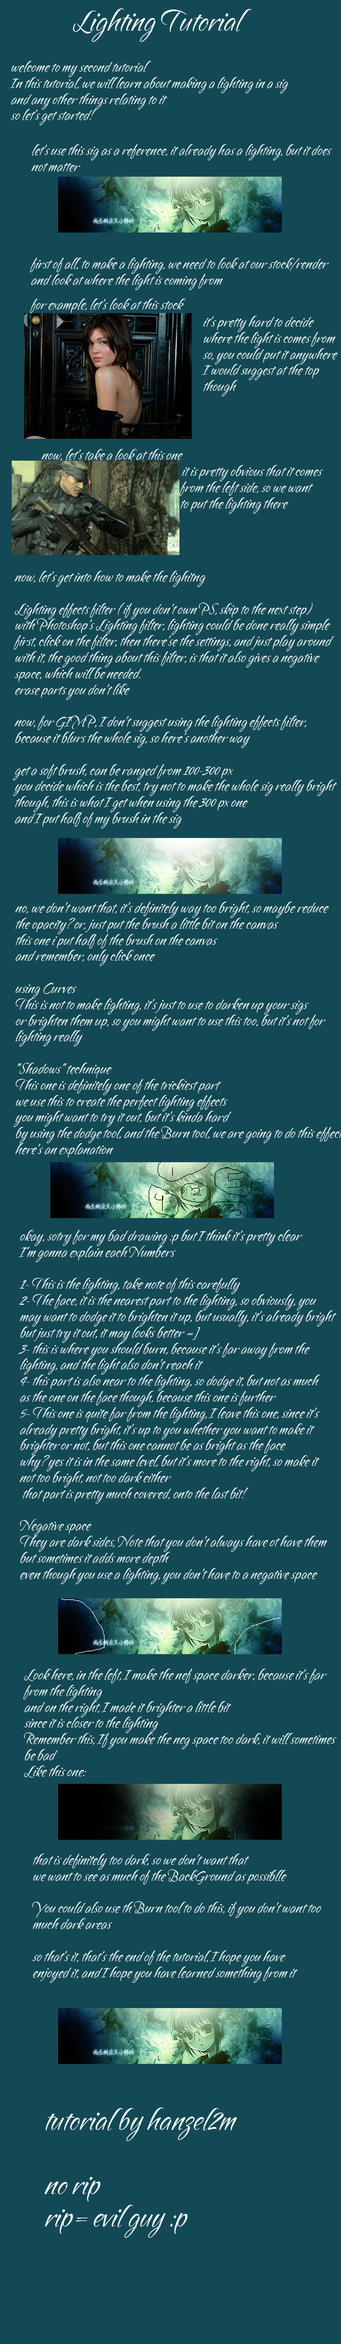 Lighting tutorial by hanzel2m